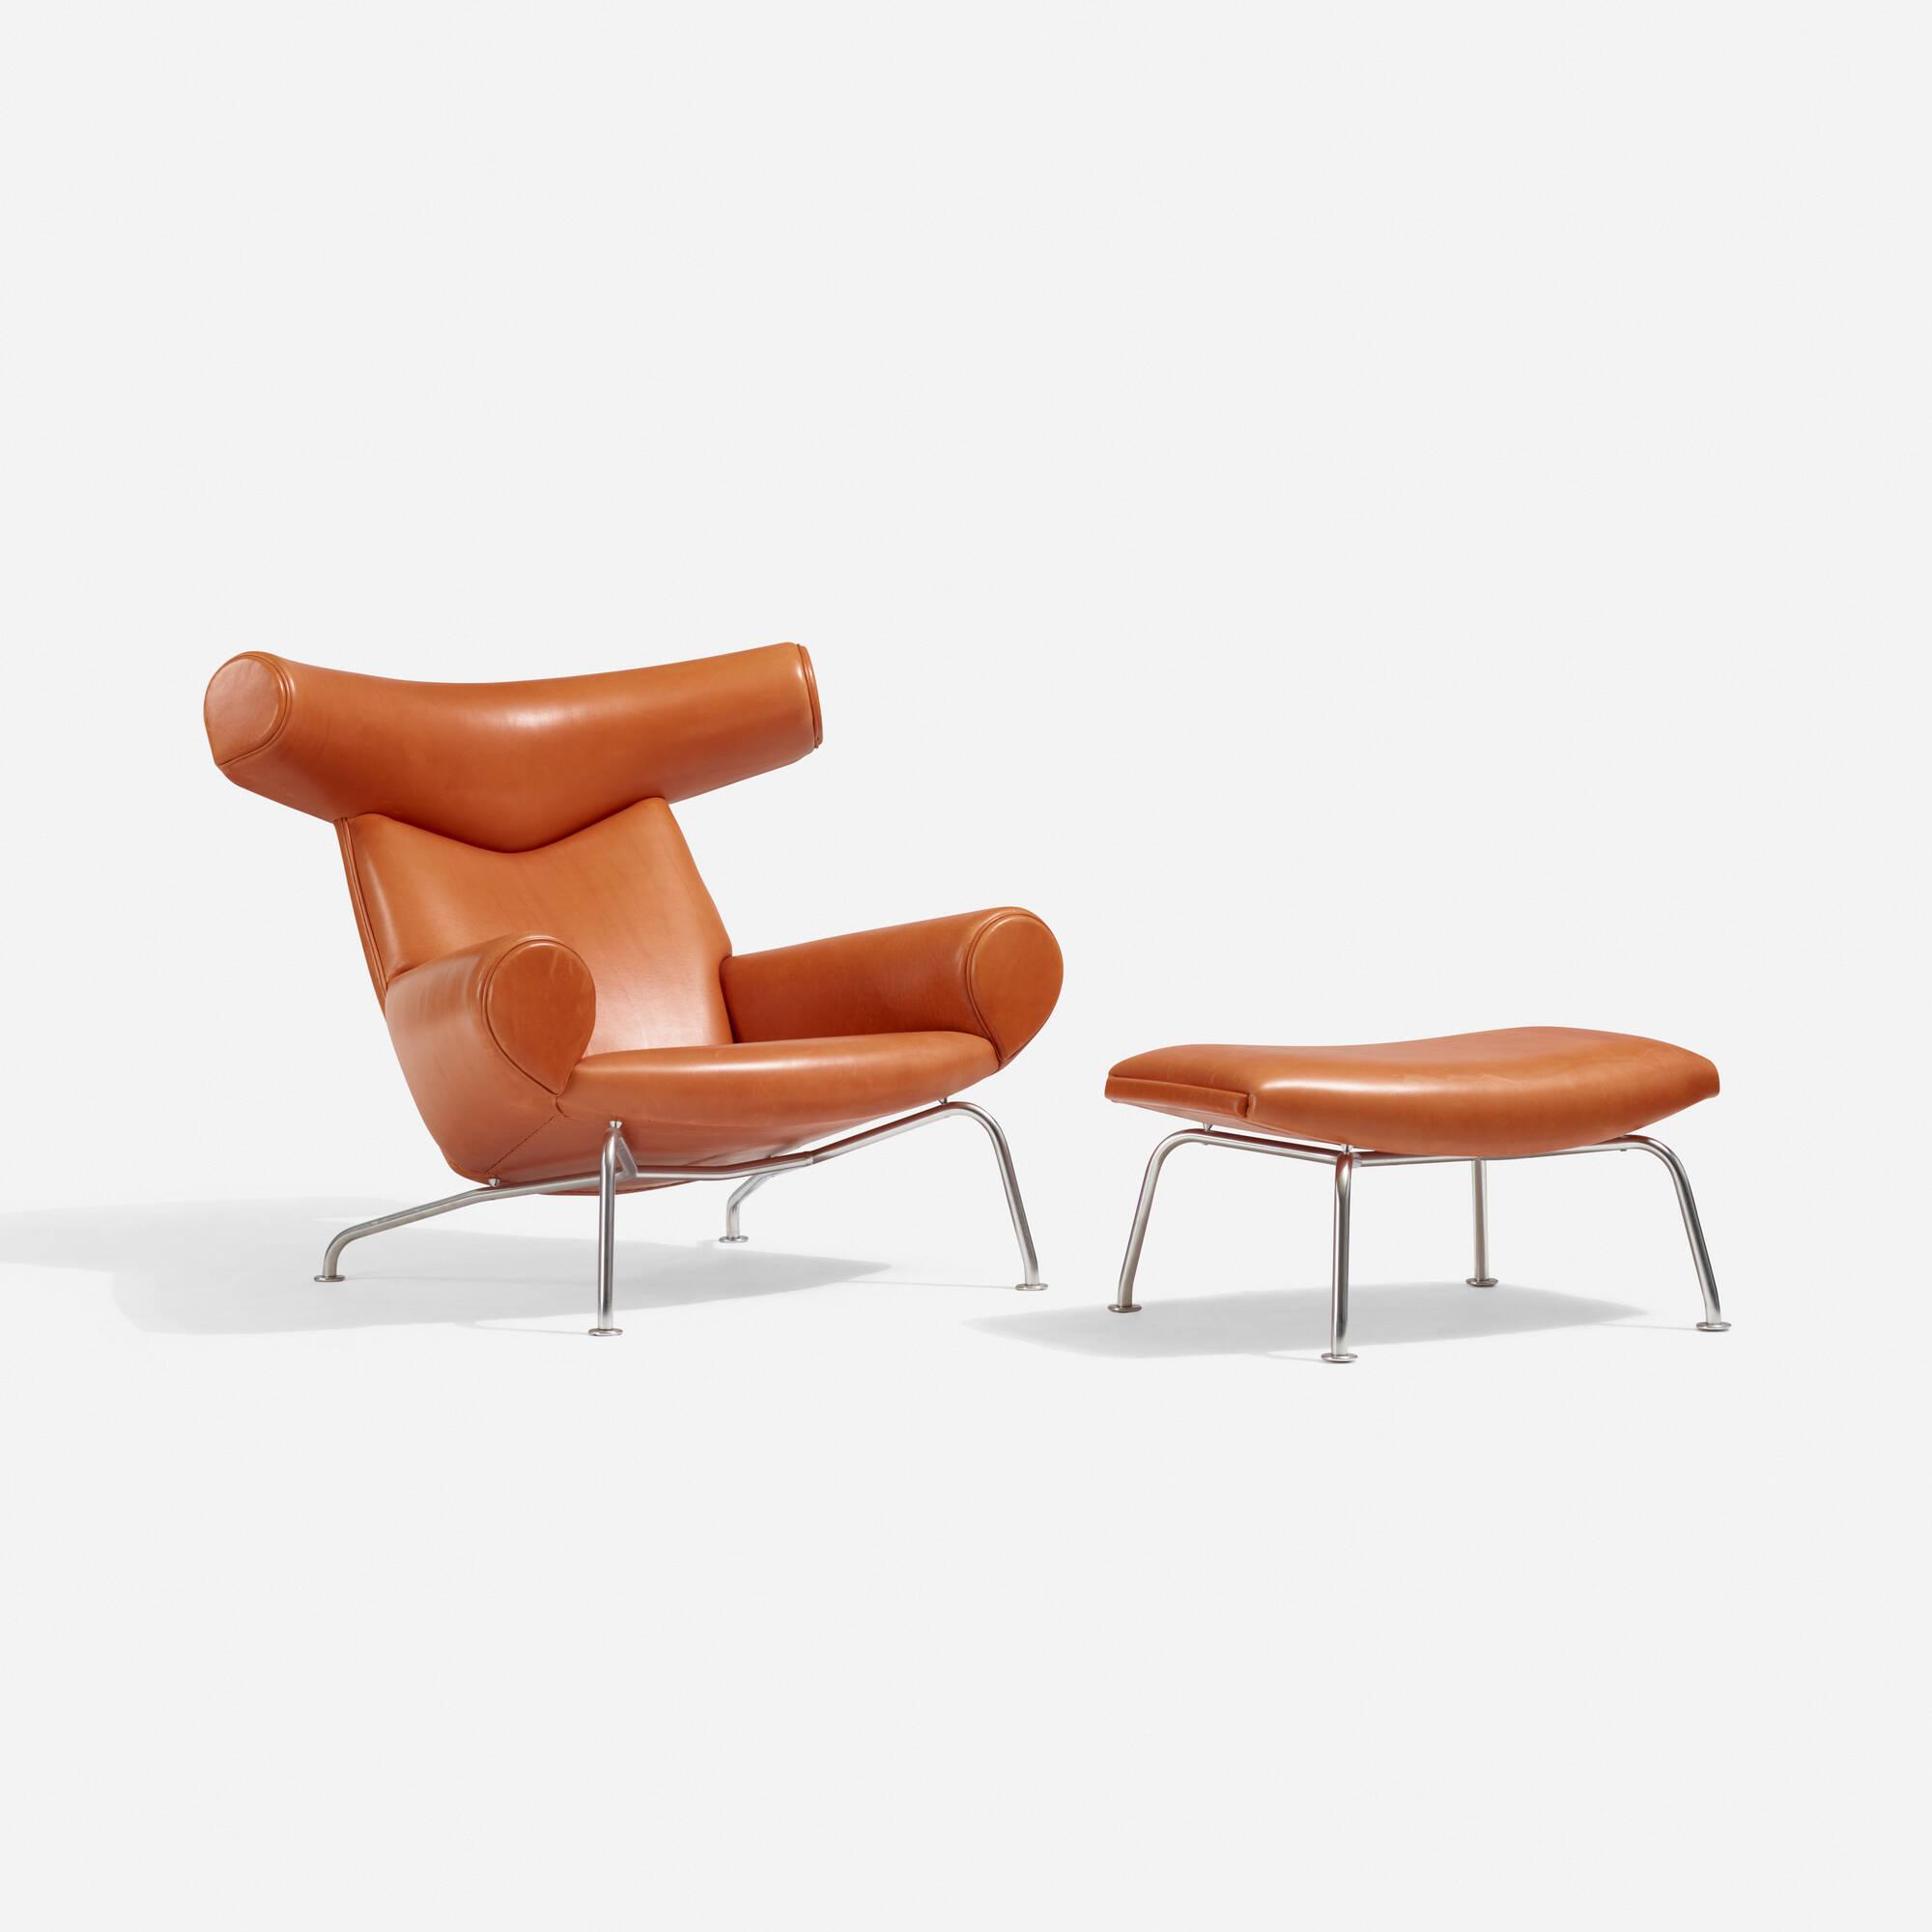 128: Hans J. Wegner / Ox Chair And Ottoman (1 Of 4)